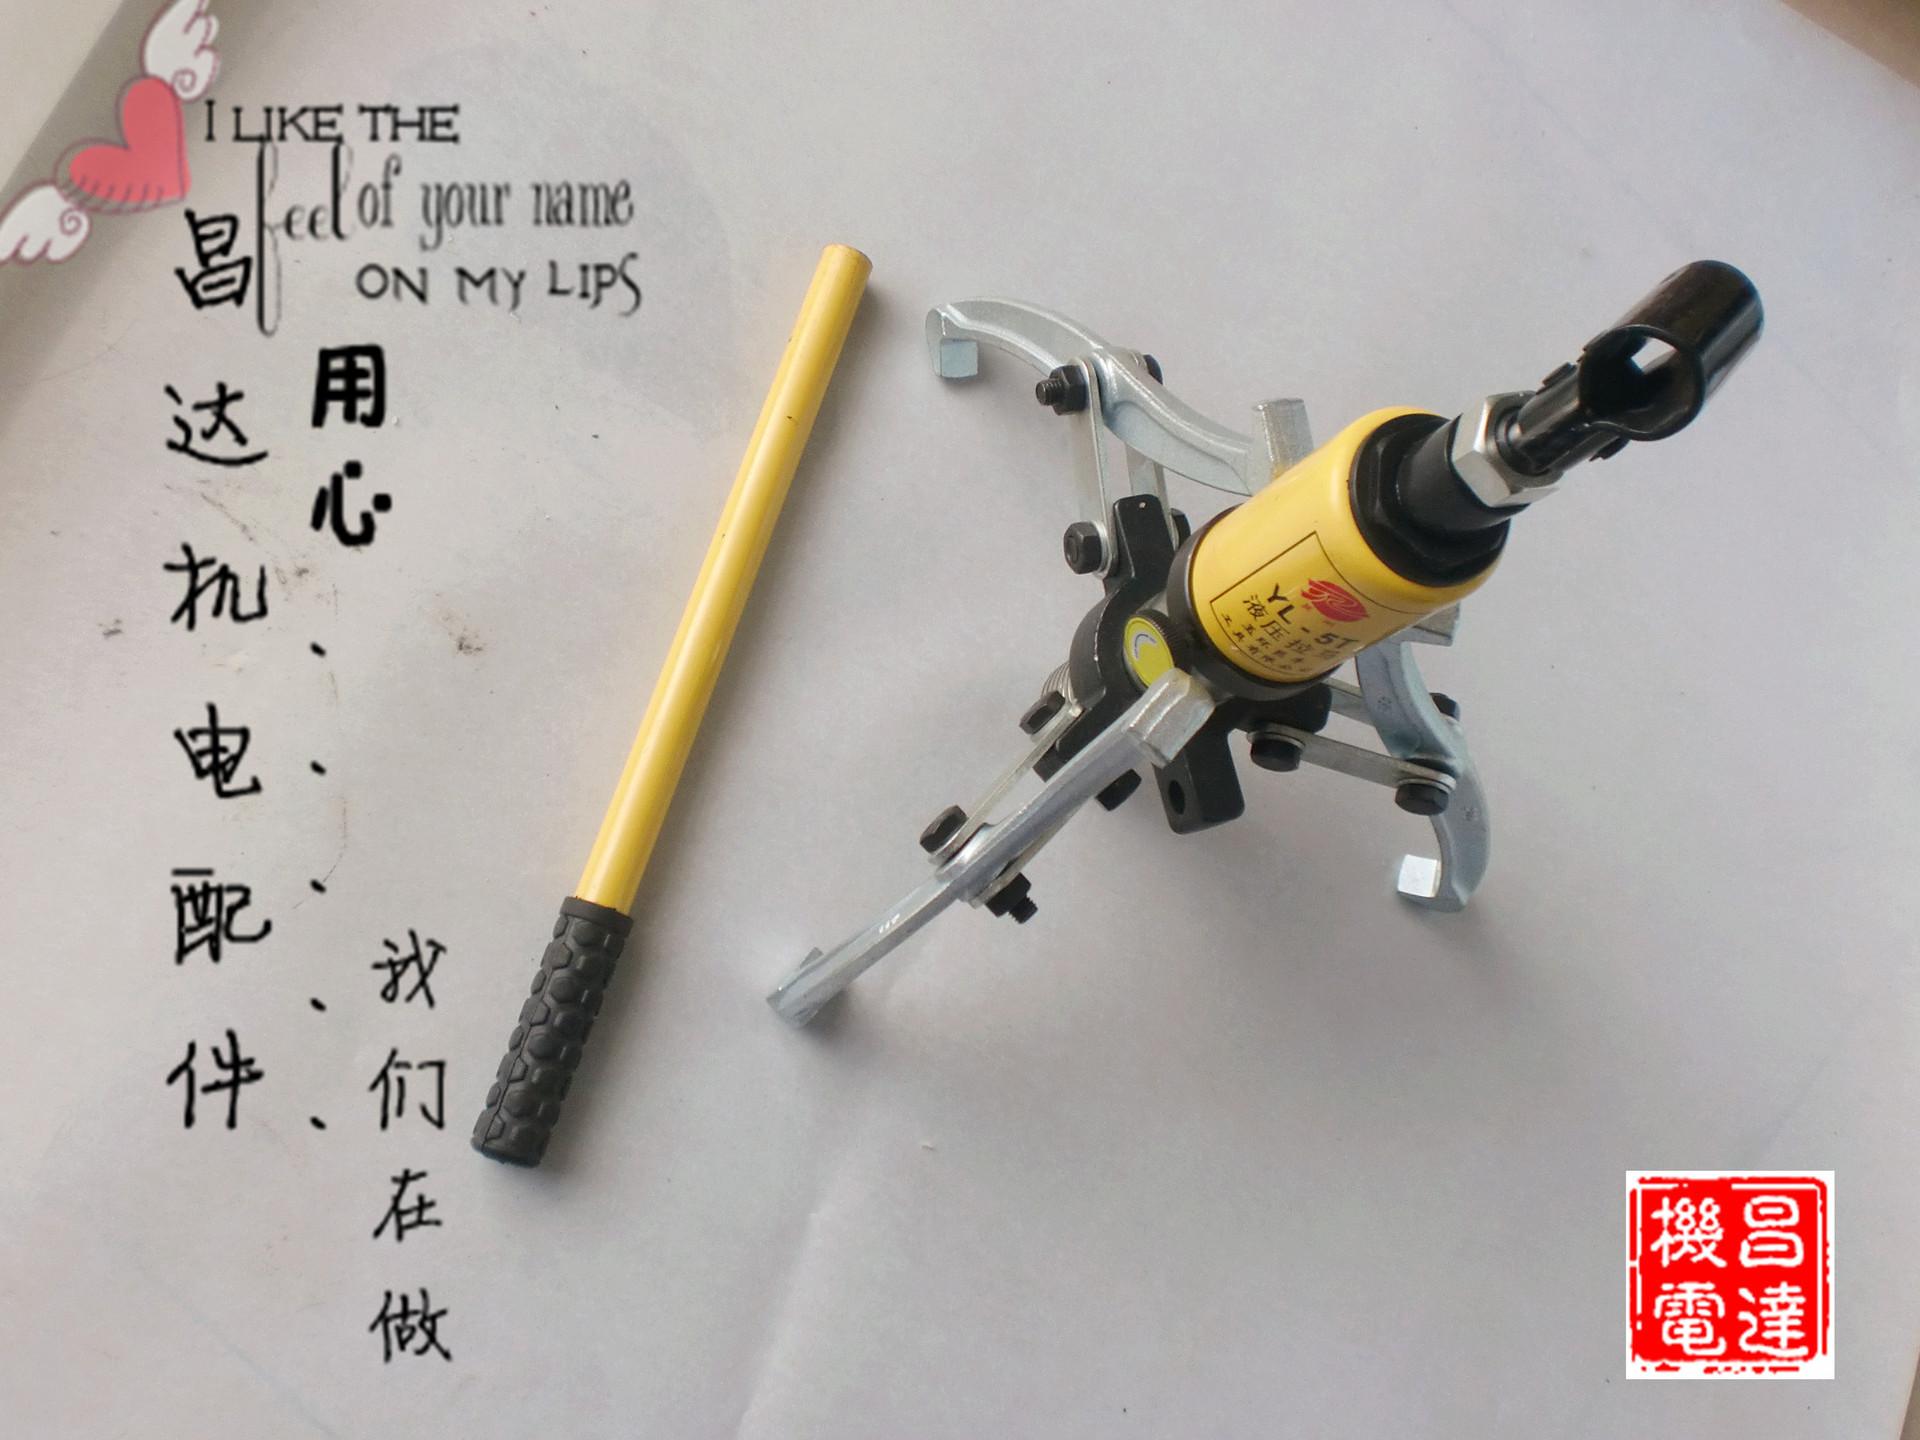 5T整体式液压拉马 三爪拉马 YL-5T-50T 液压拔轮器 可换二